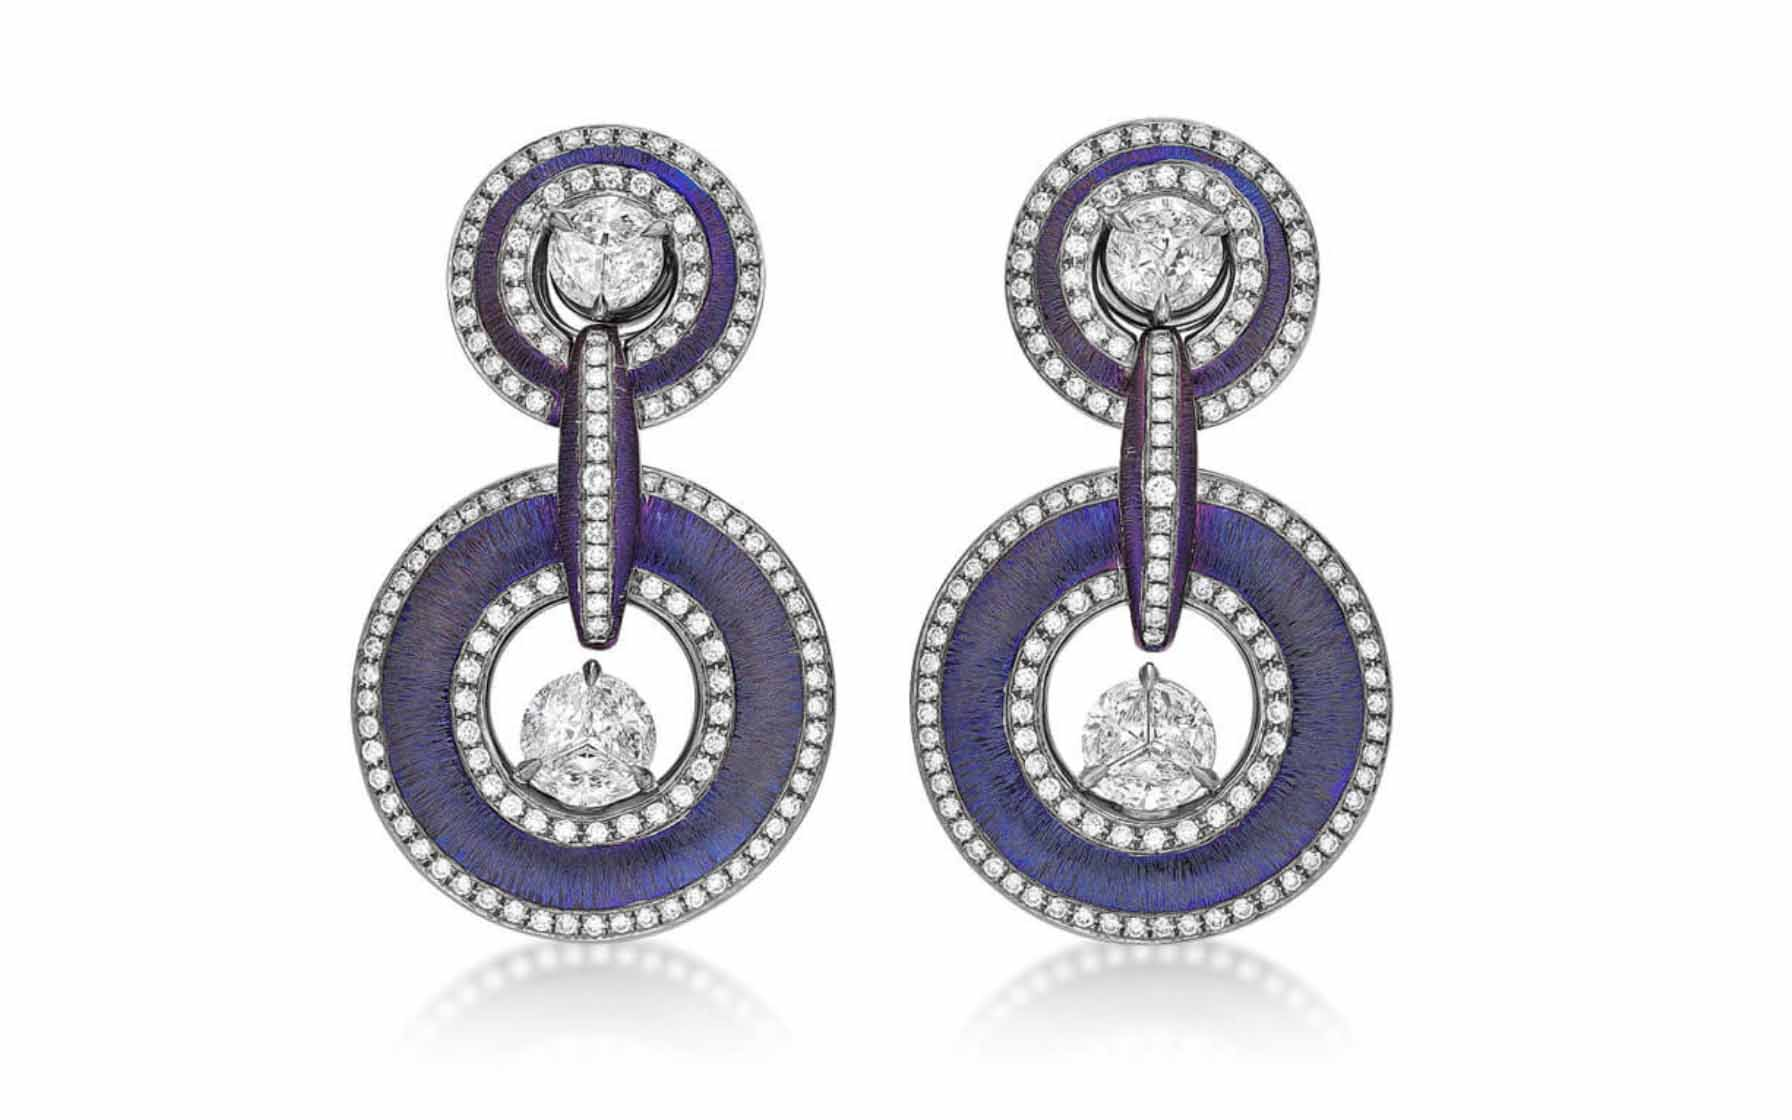 Marissa - Saboo jewelry